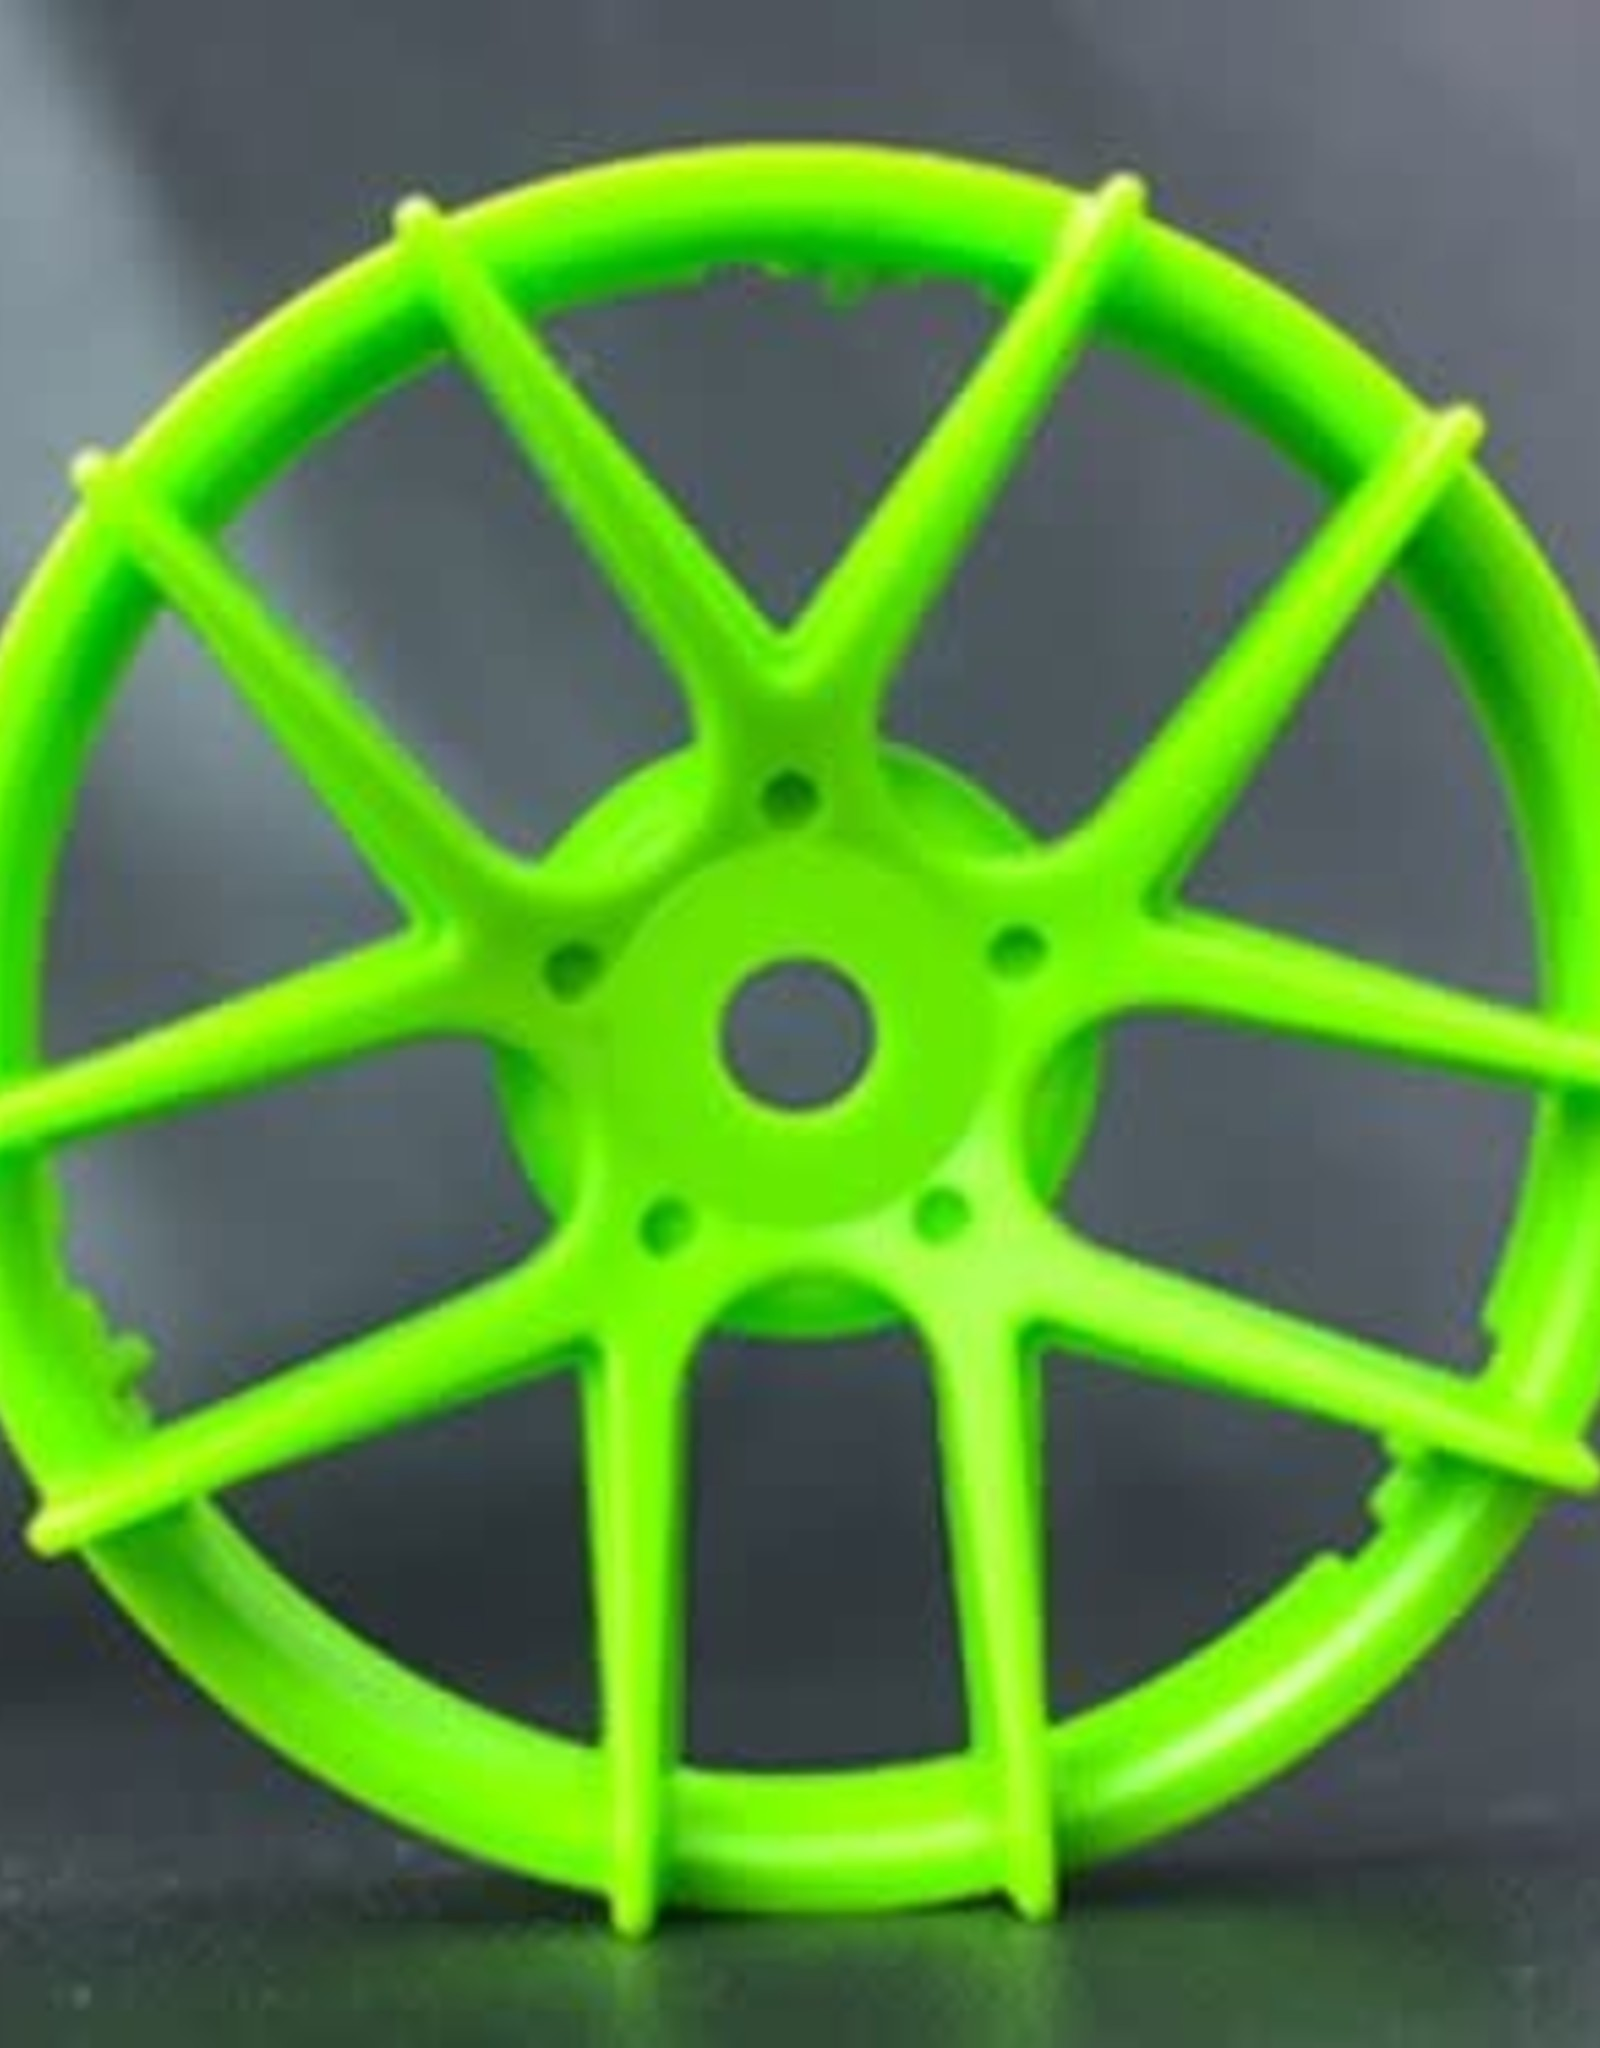 Tetsujin TT-7545 Super Rim Jasmine Green Disks 2pcs. by Tetsujin